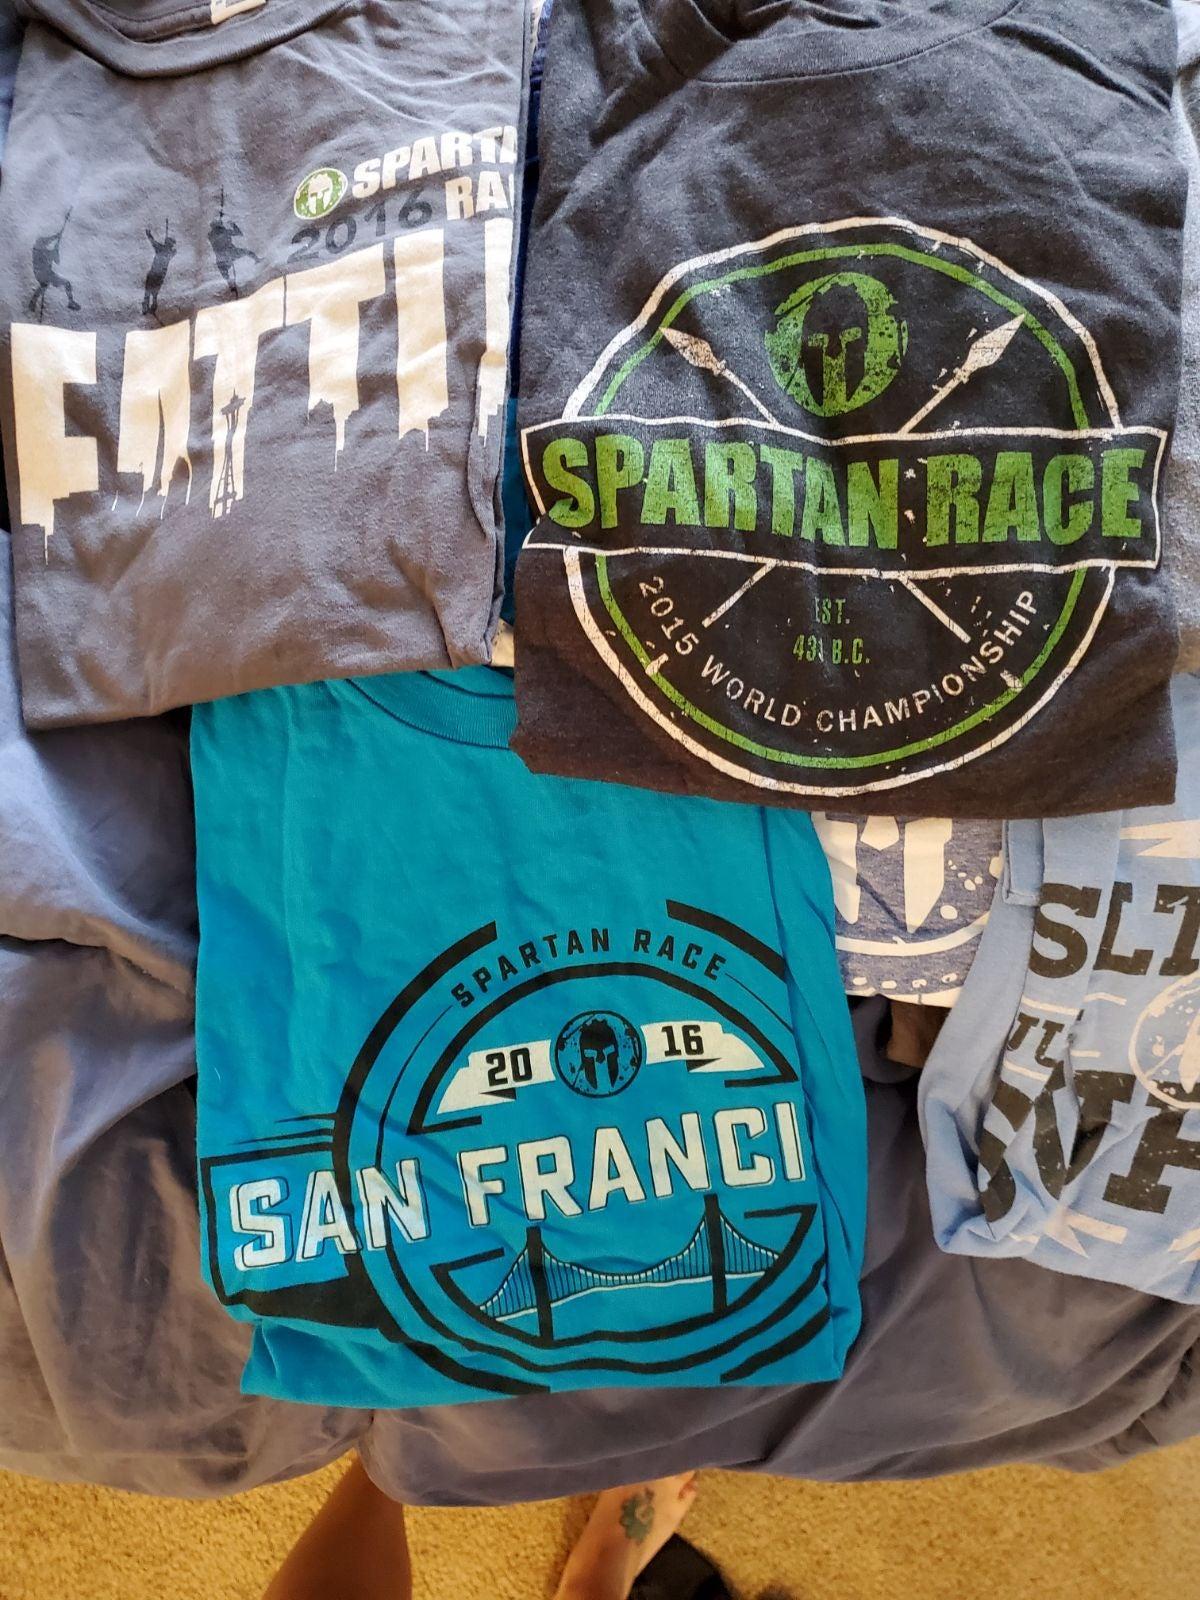 Spartan Race Venue Tees